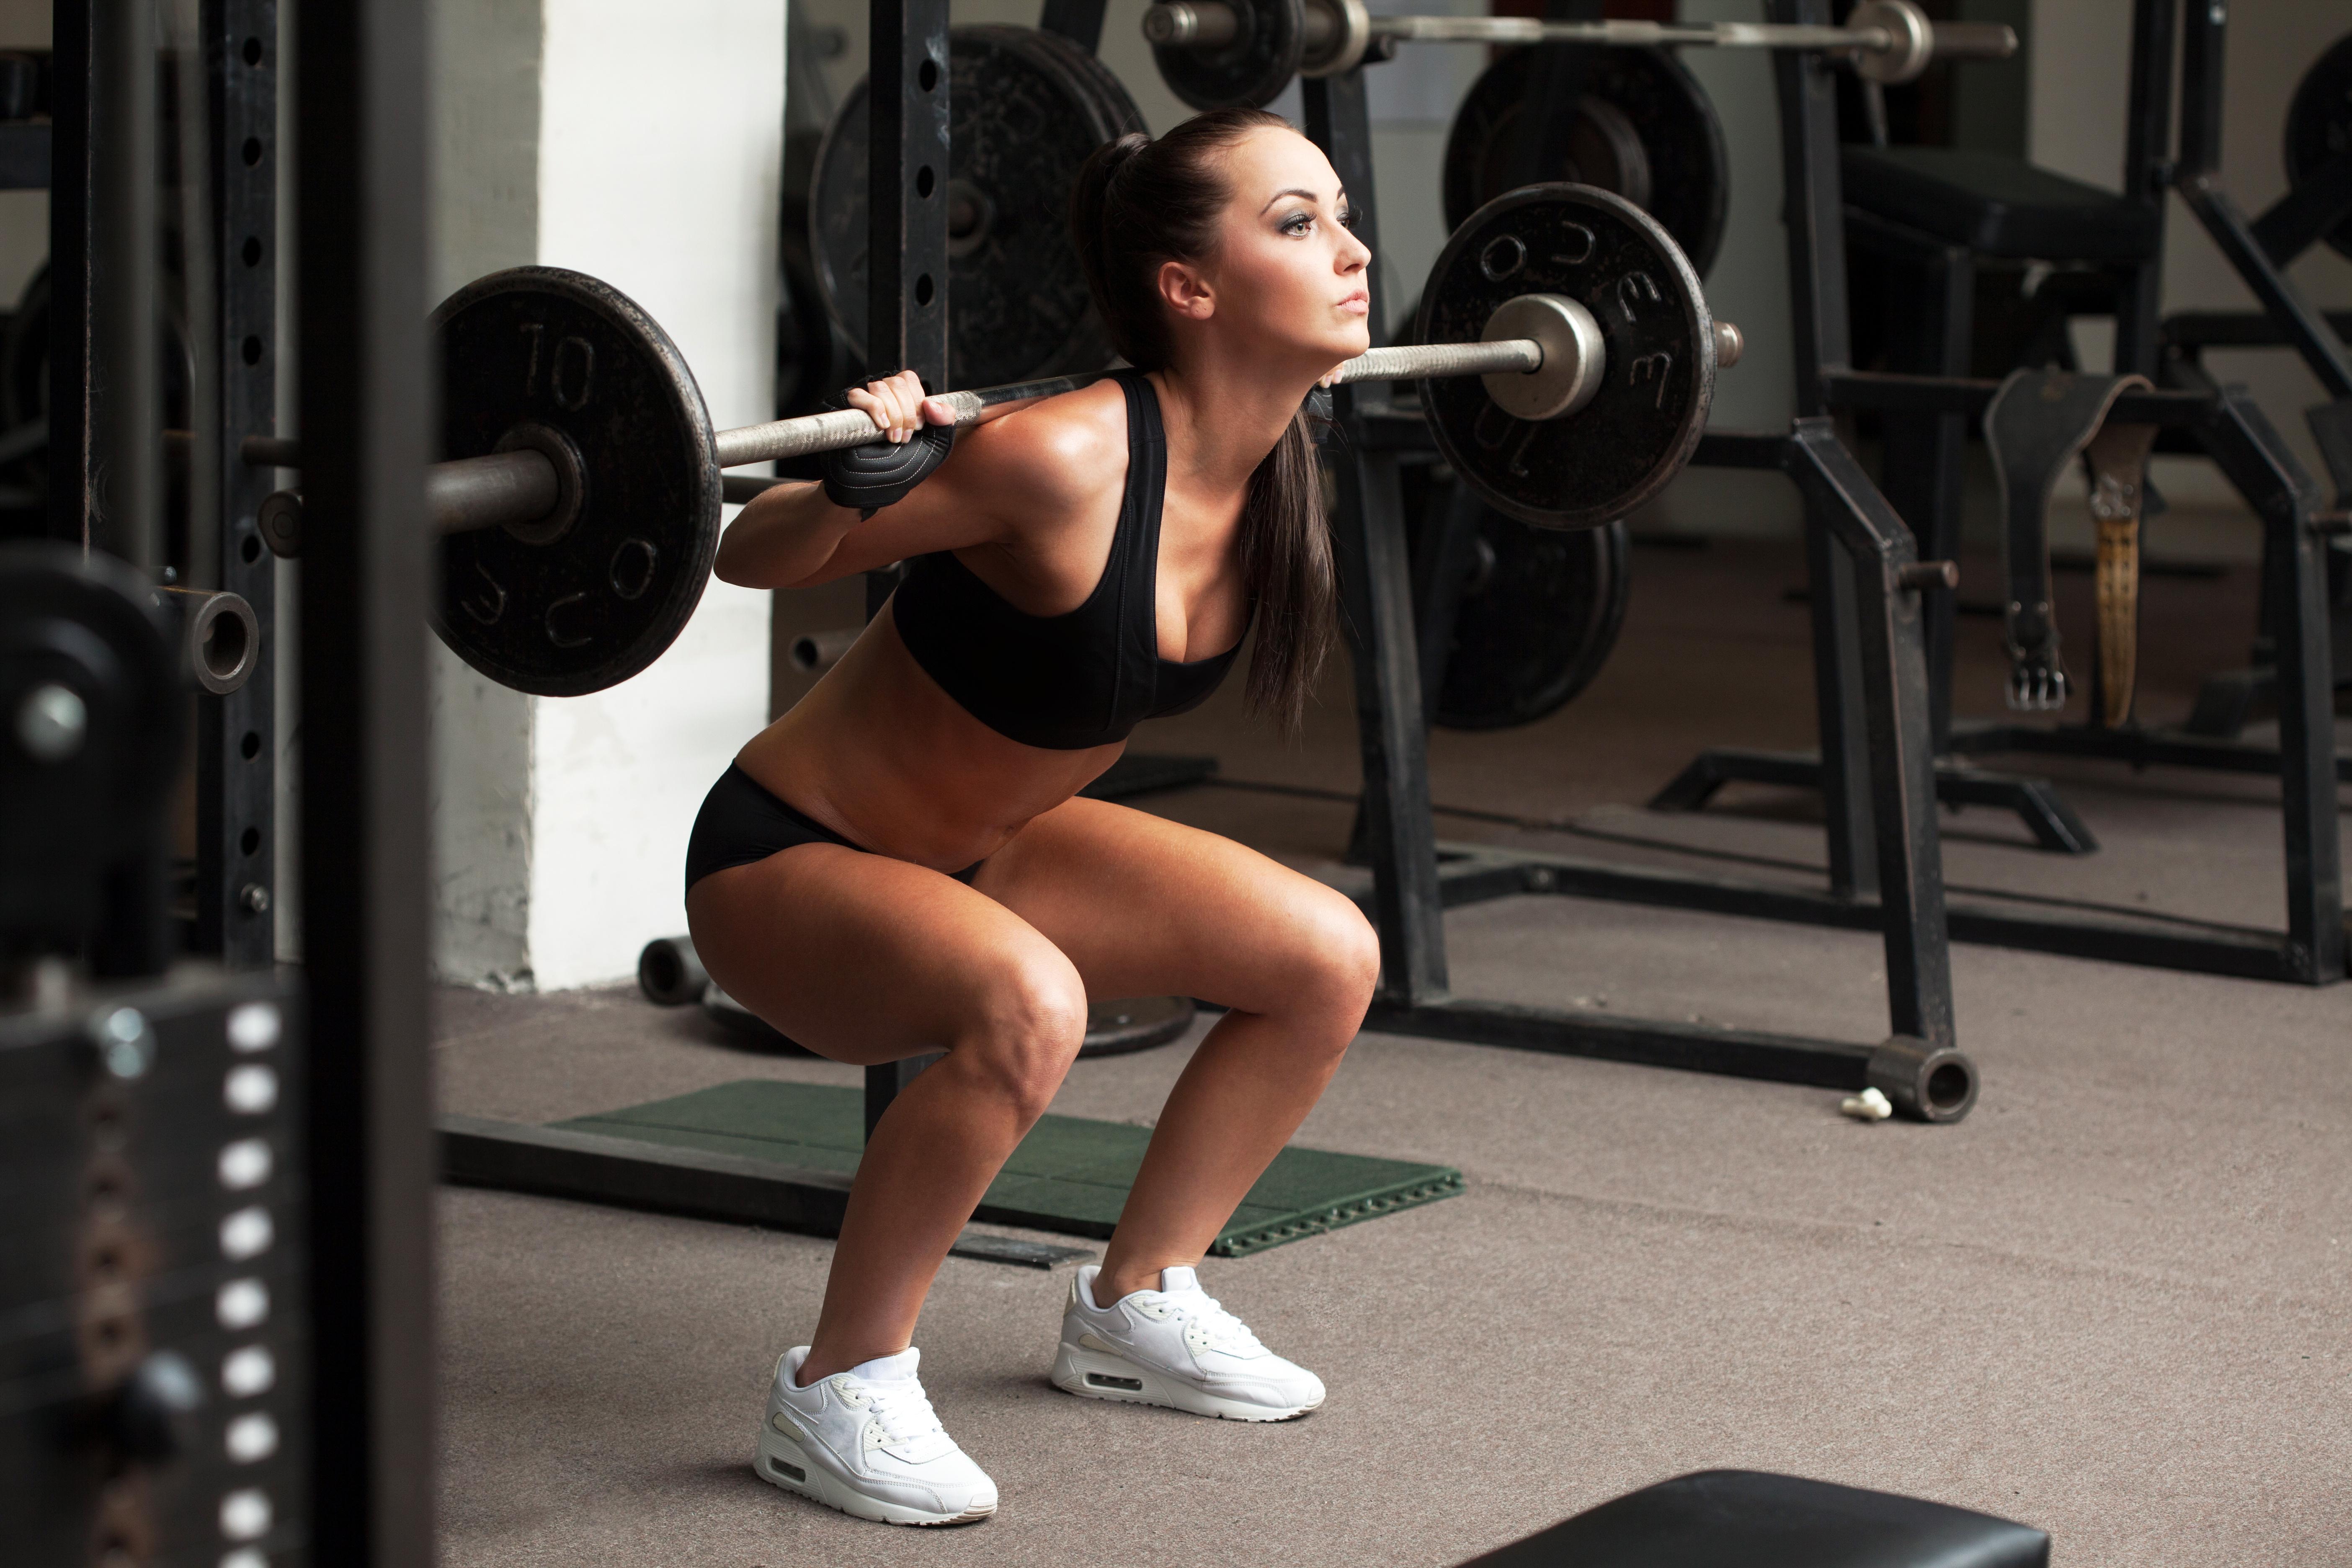 Girl weight lifting wallpaper